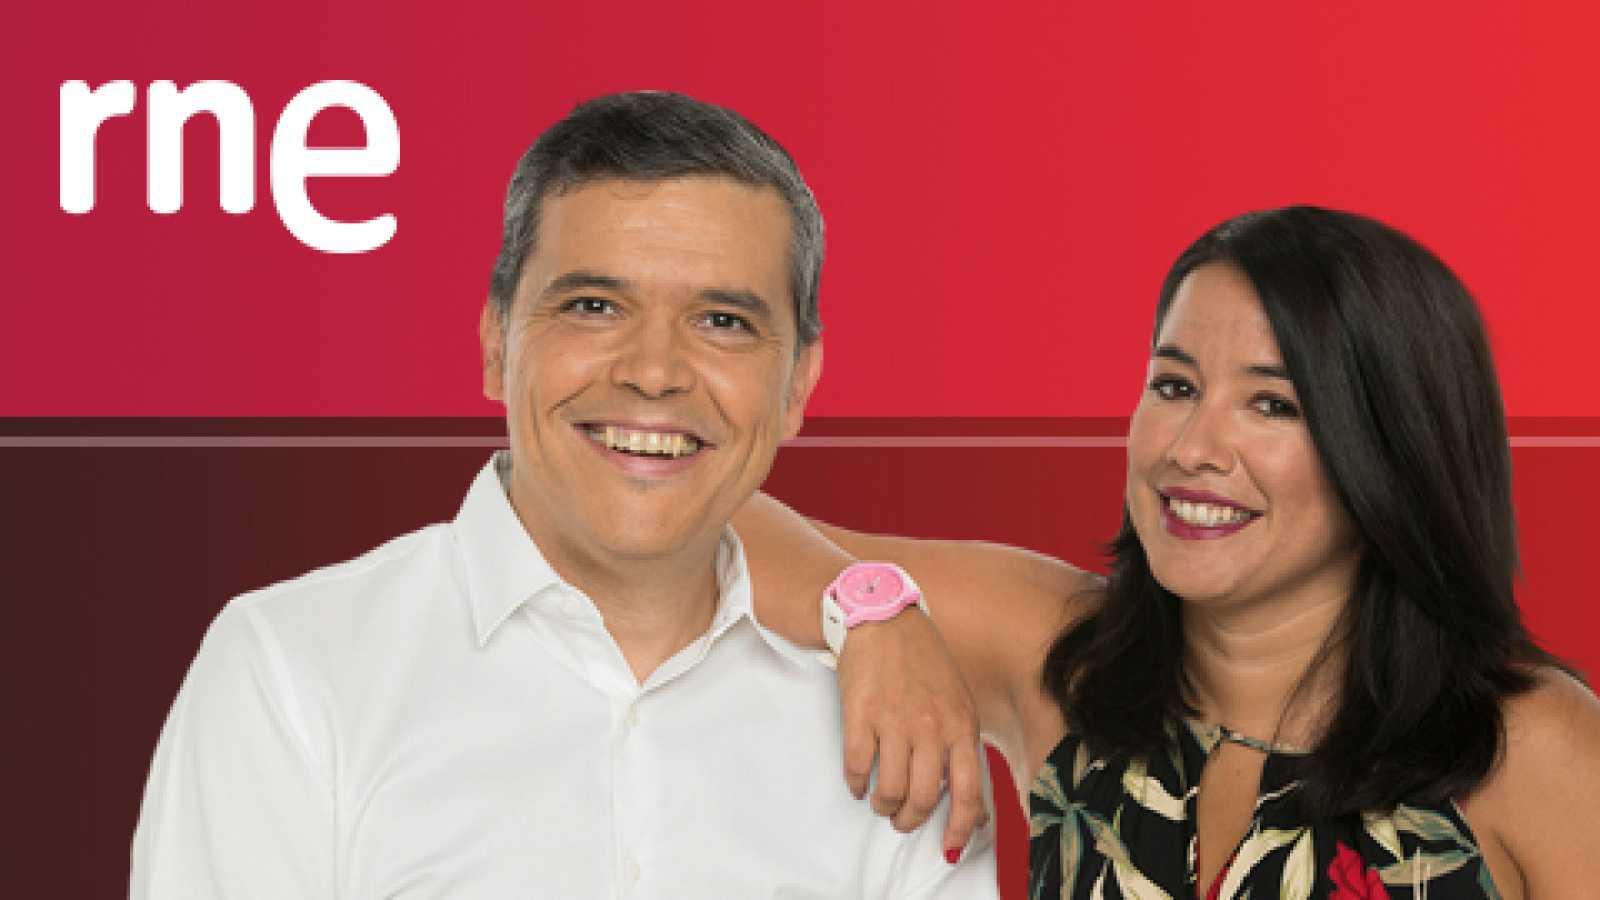 Las mañanas de RNE con Alfredo Menéndez - Segunda hora - 30/04/19 - Escuchar ahora